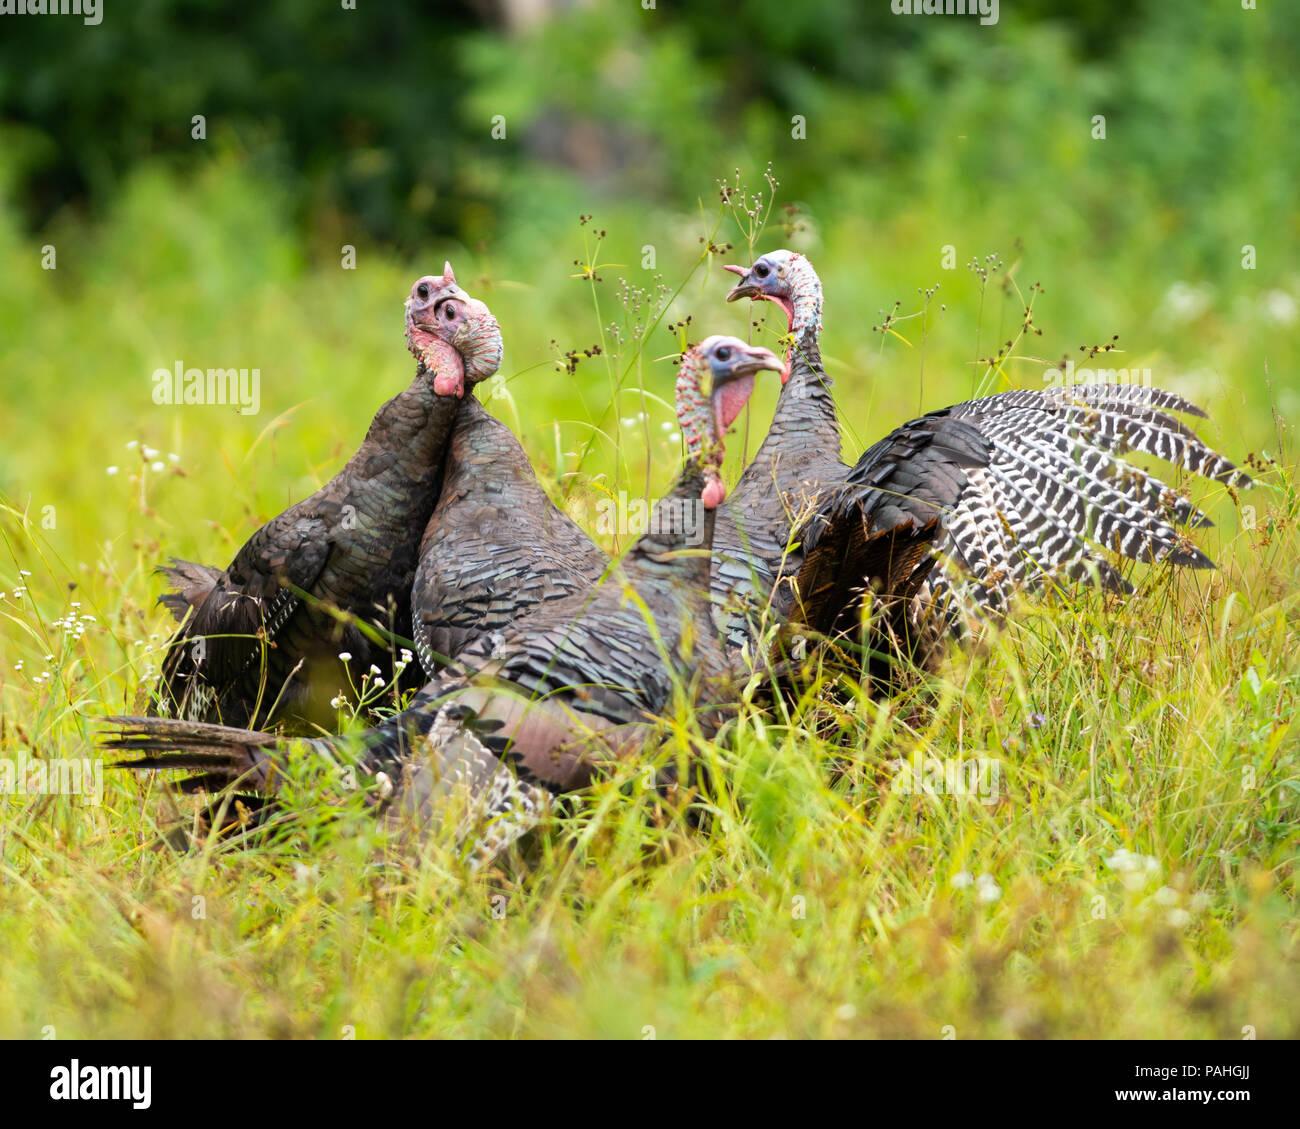 Four wild eastern turkeys fighting to establish dominance of the flock, in the Adirondack Mountains, NY USA - Stock Image